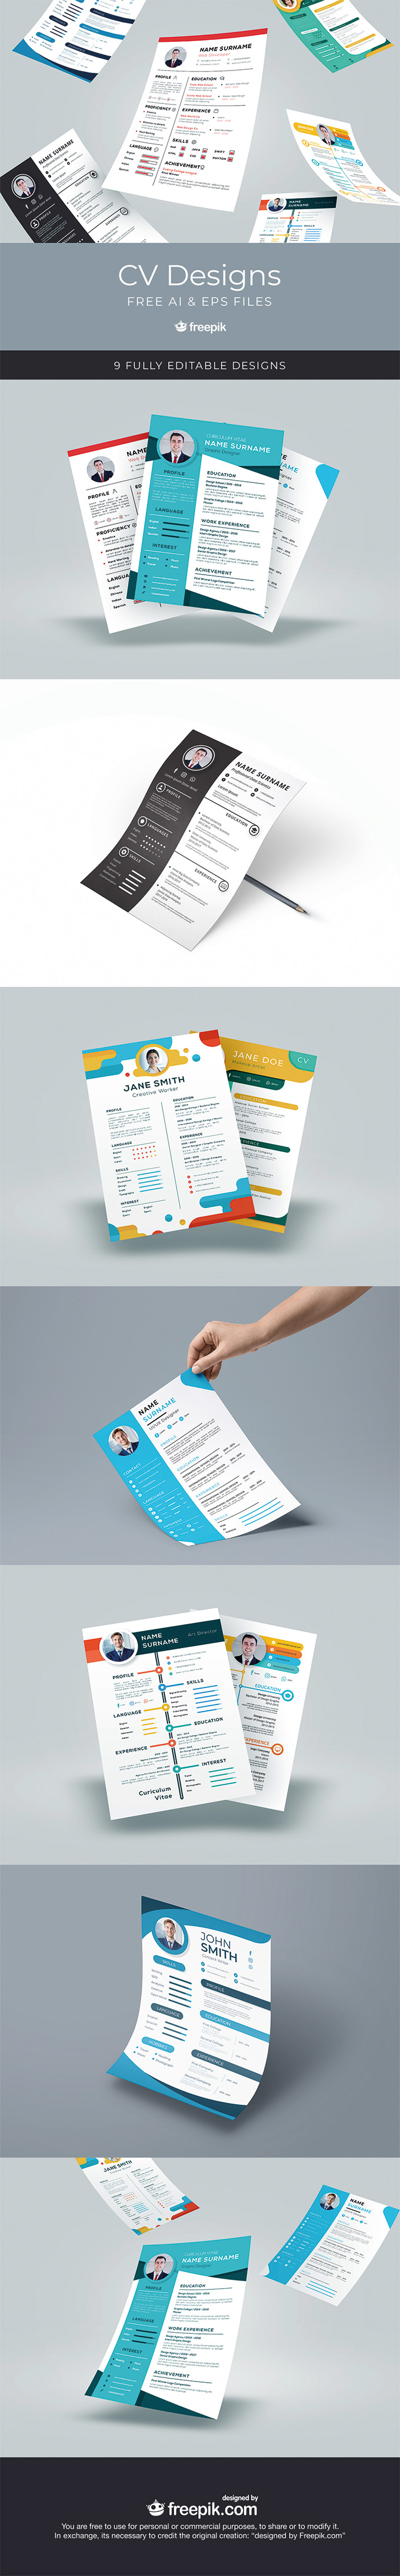 CV Designs Template Set